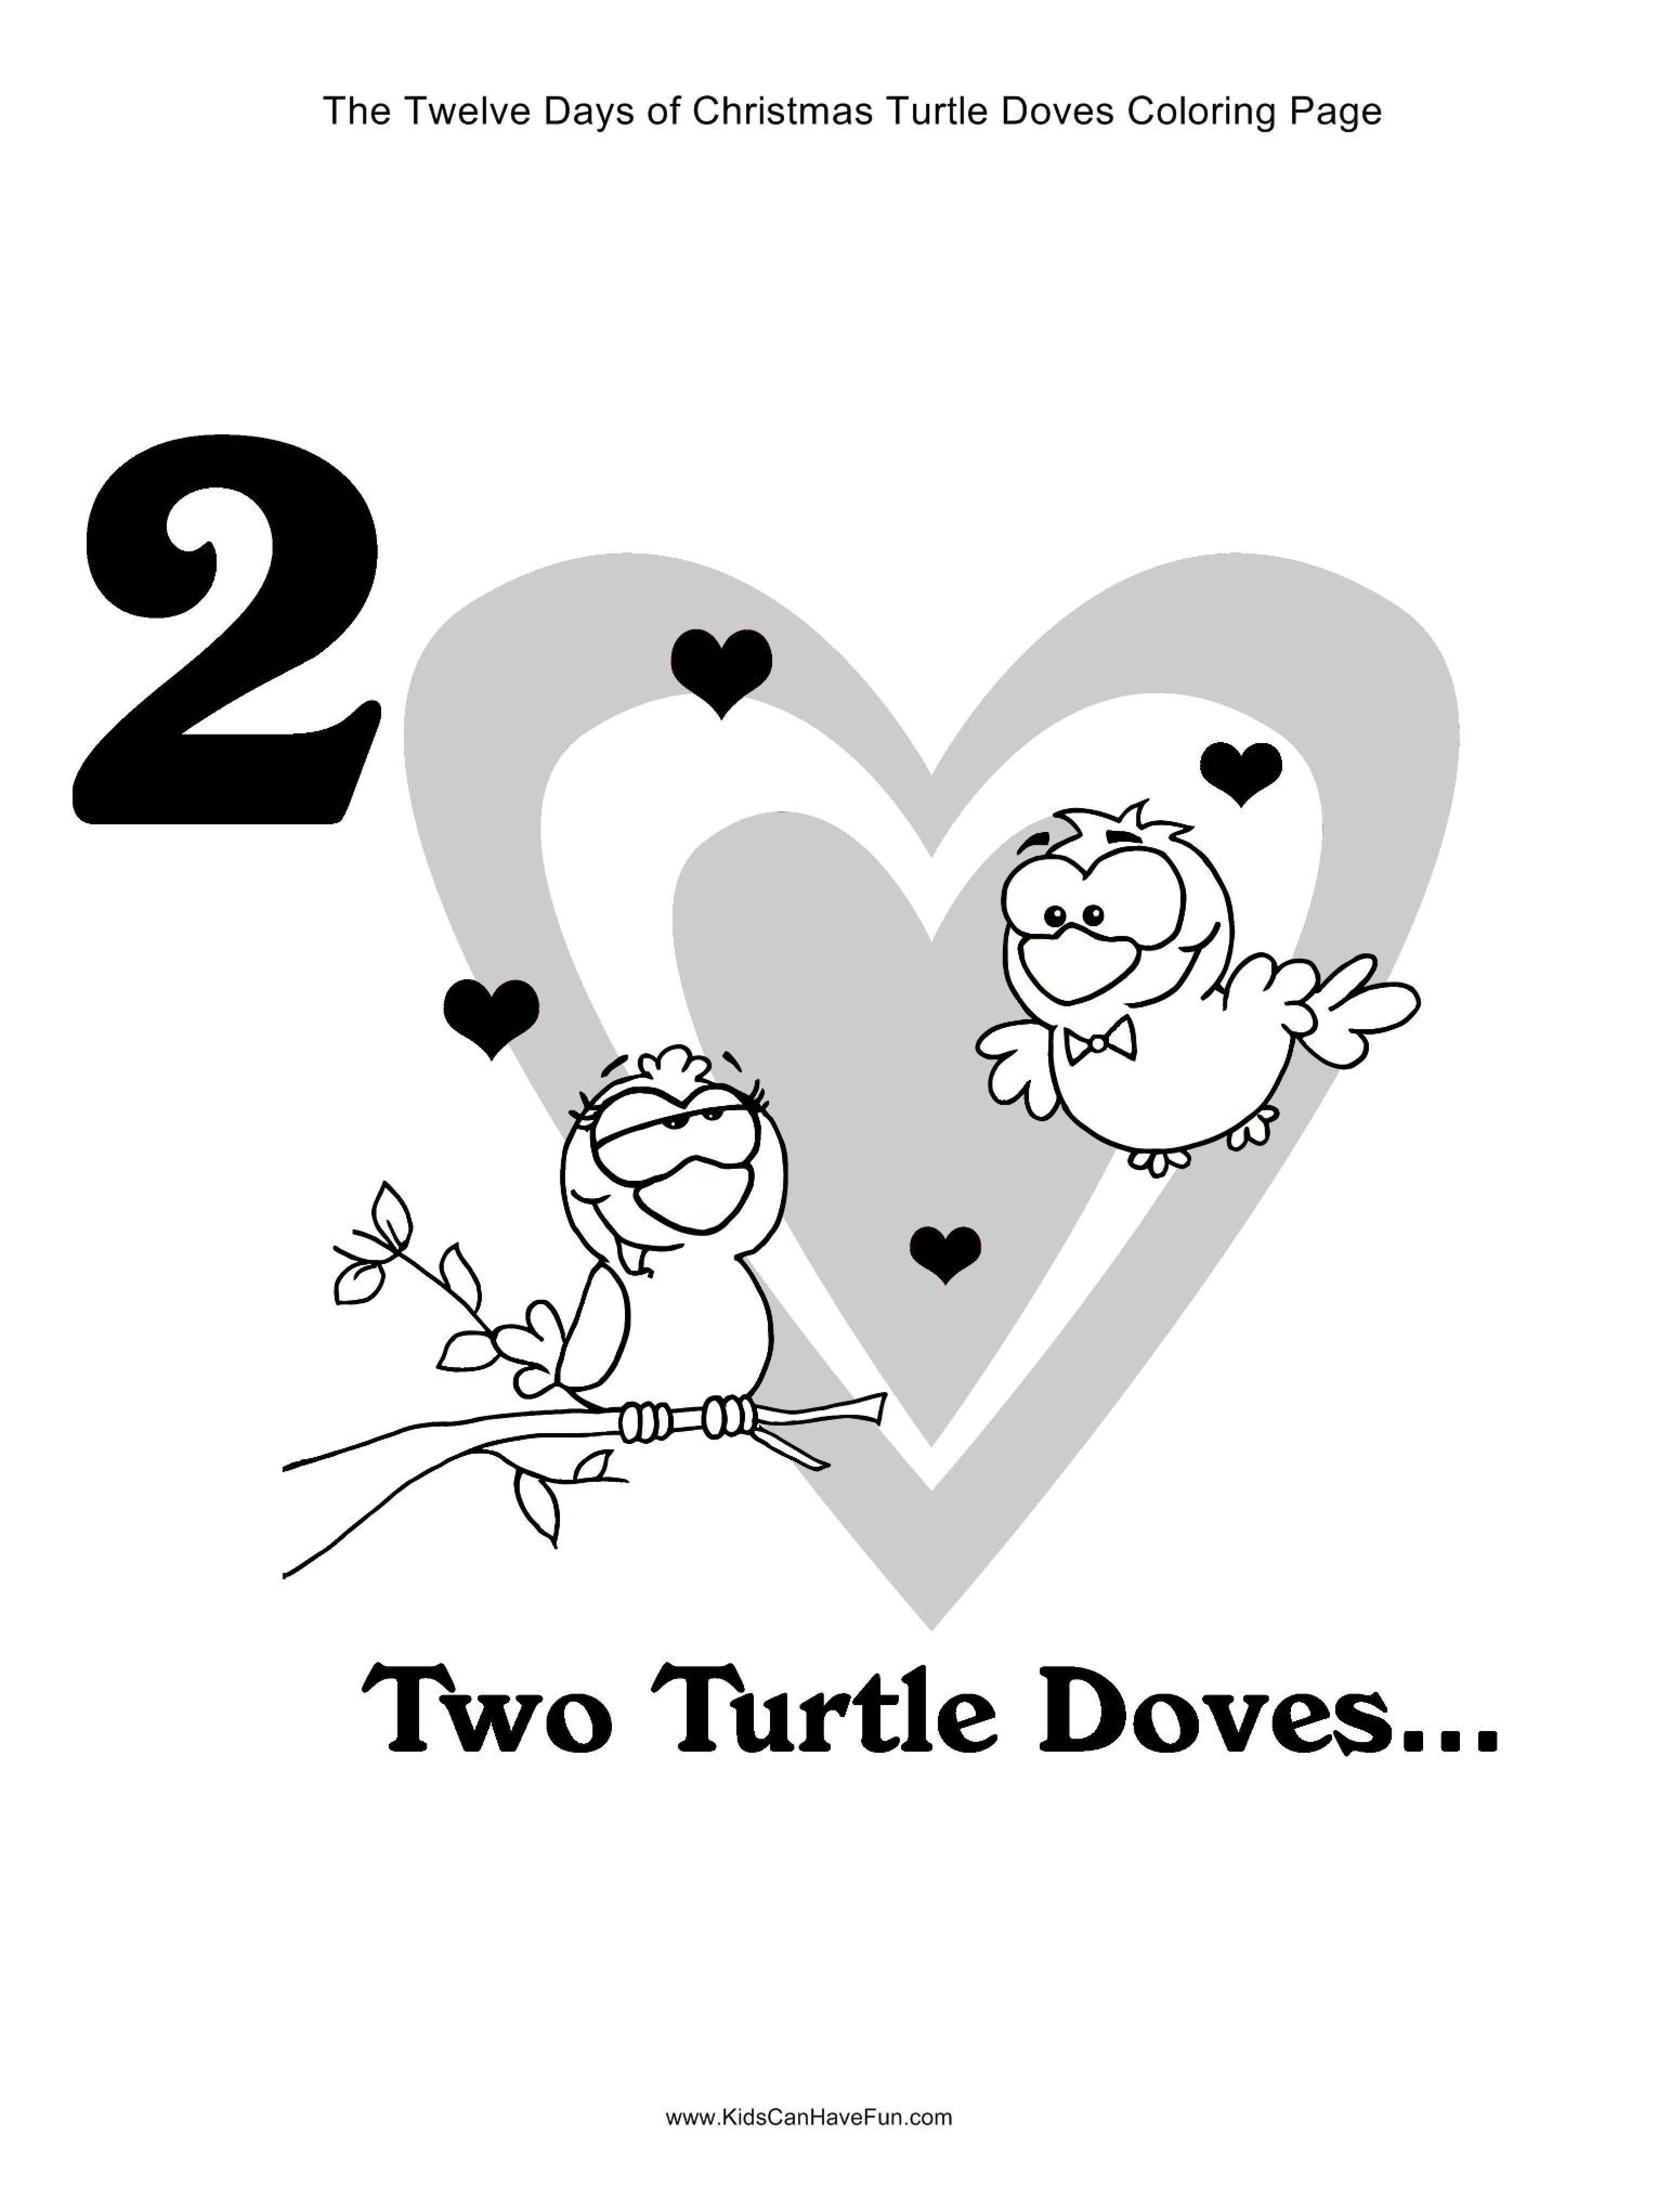 Pin By Kidscanhavefun On Twelve Days Of Christmas Printables Worksheets Coloring Games